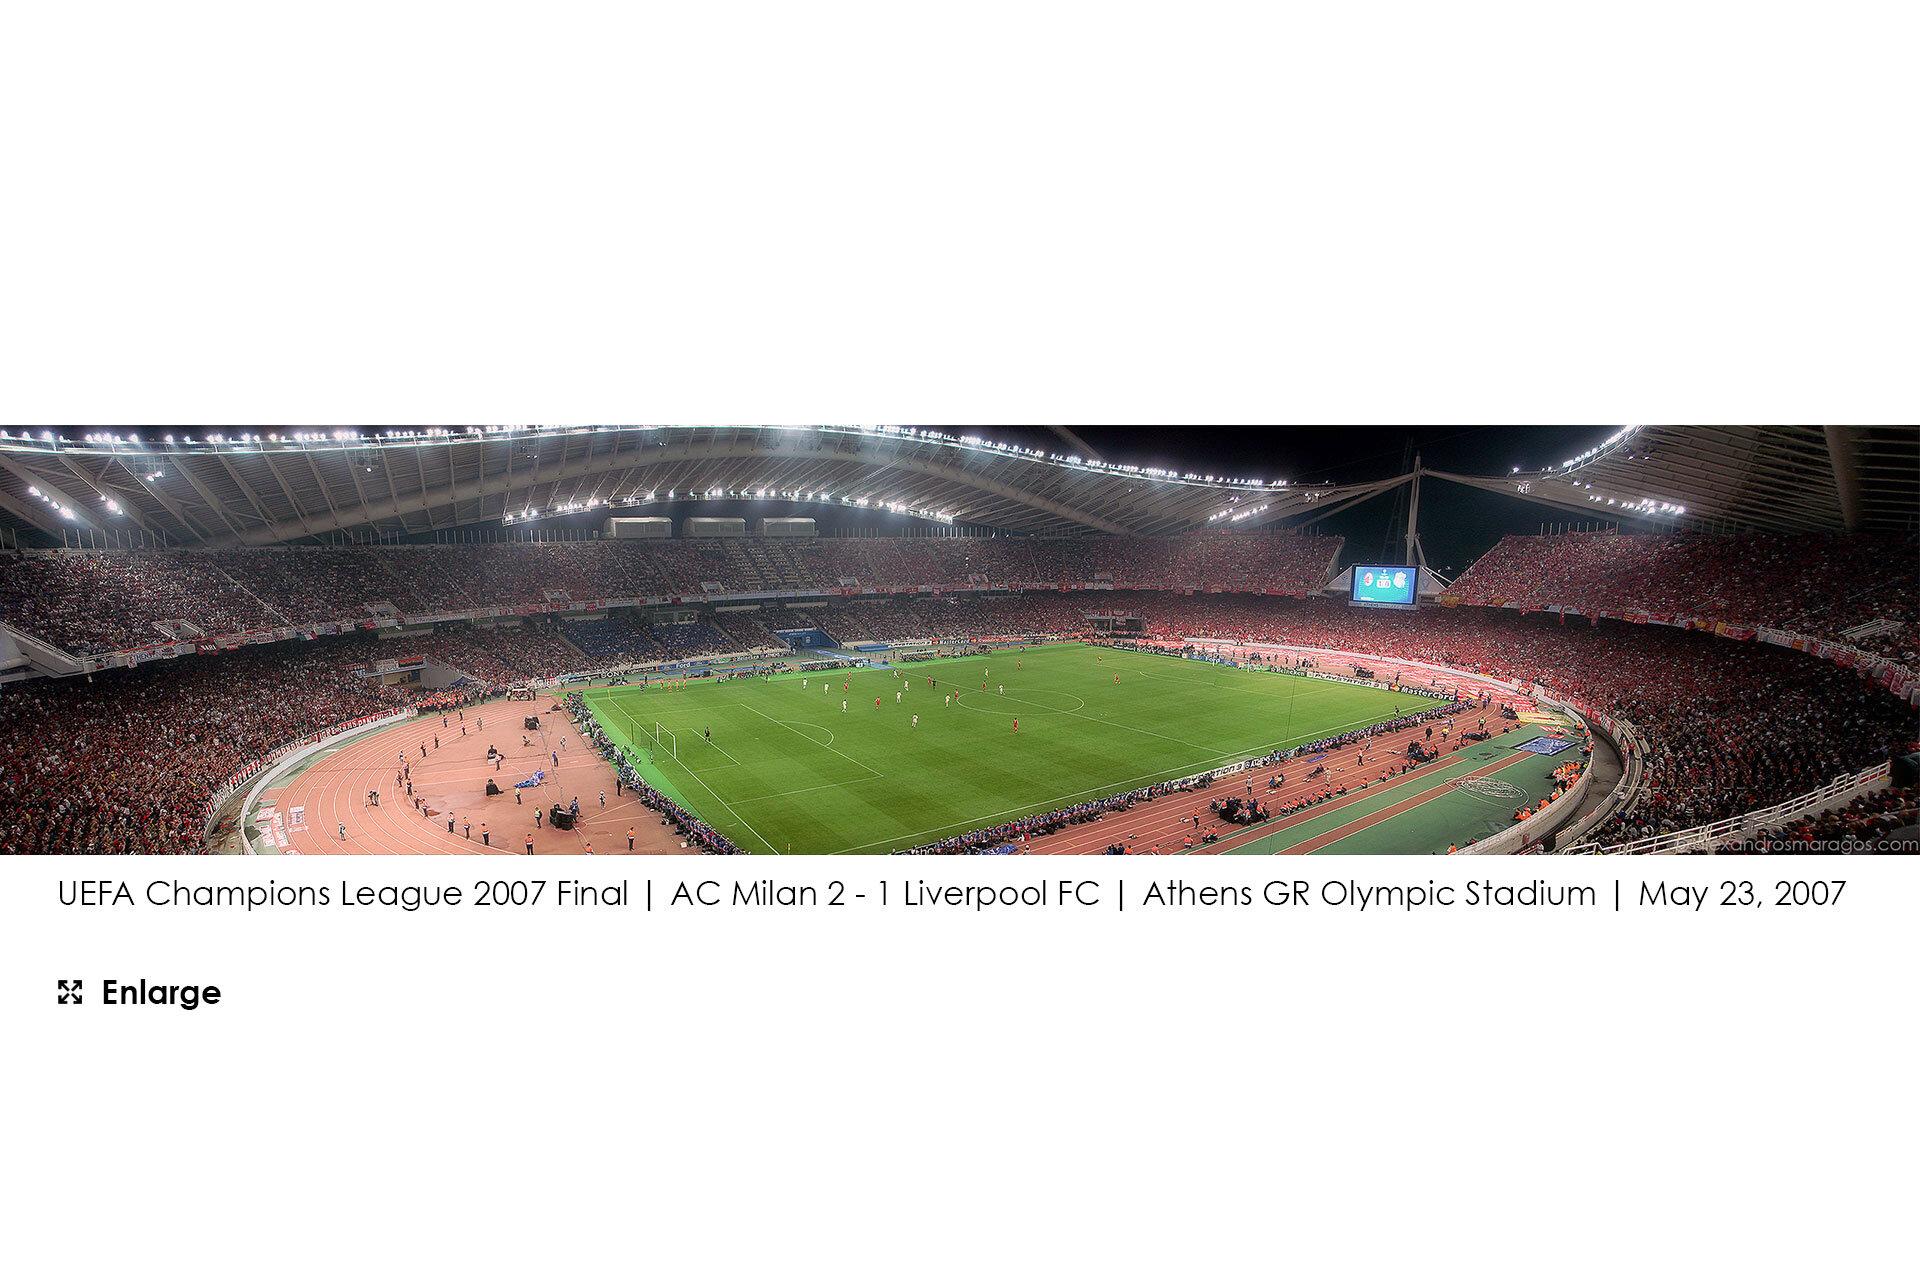 alexandros-maragos-uefa-champions-league-final-2007-thumb.jpg